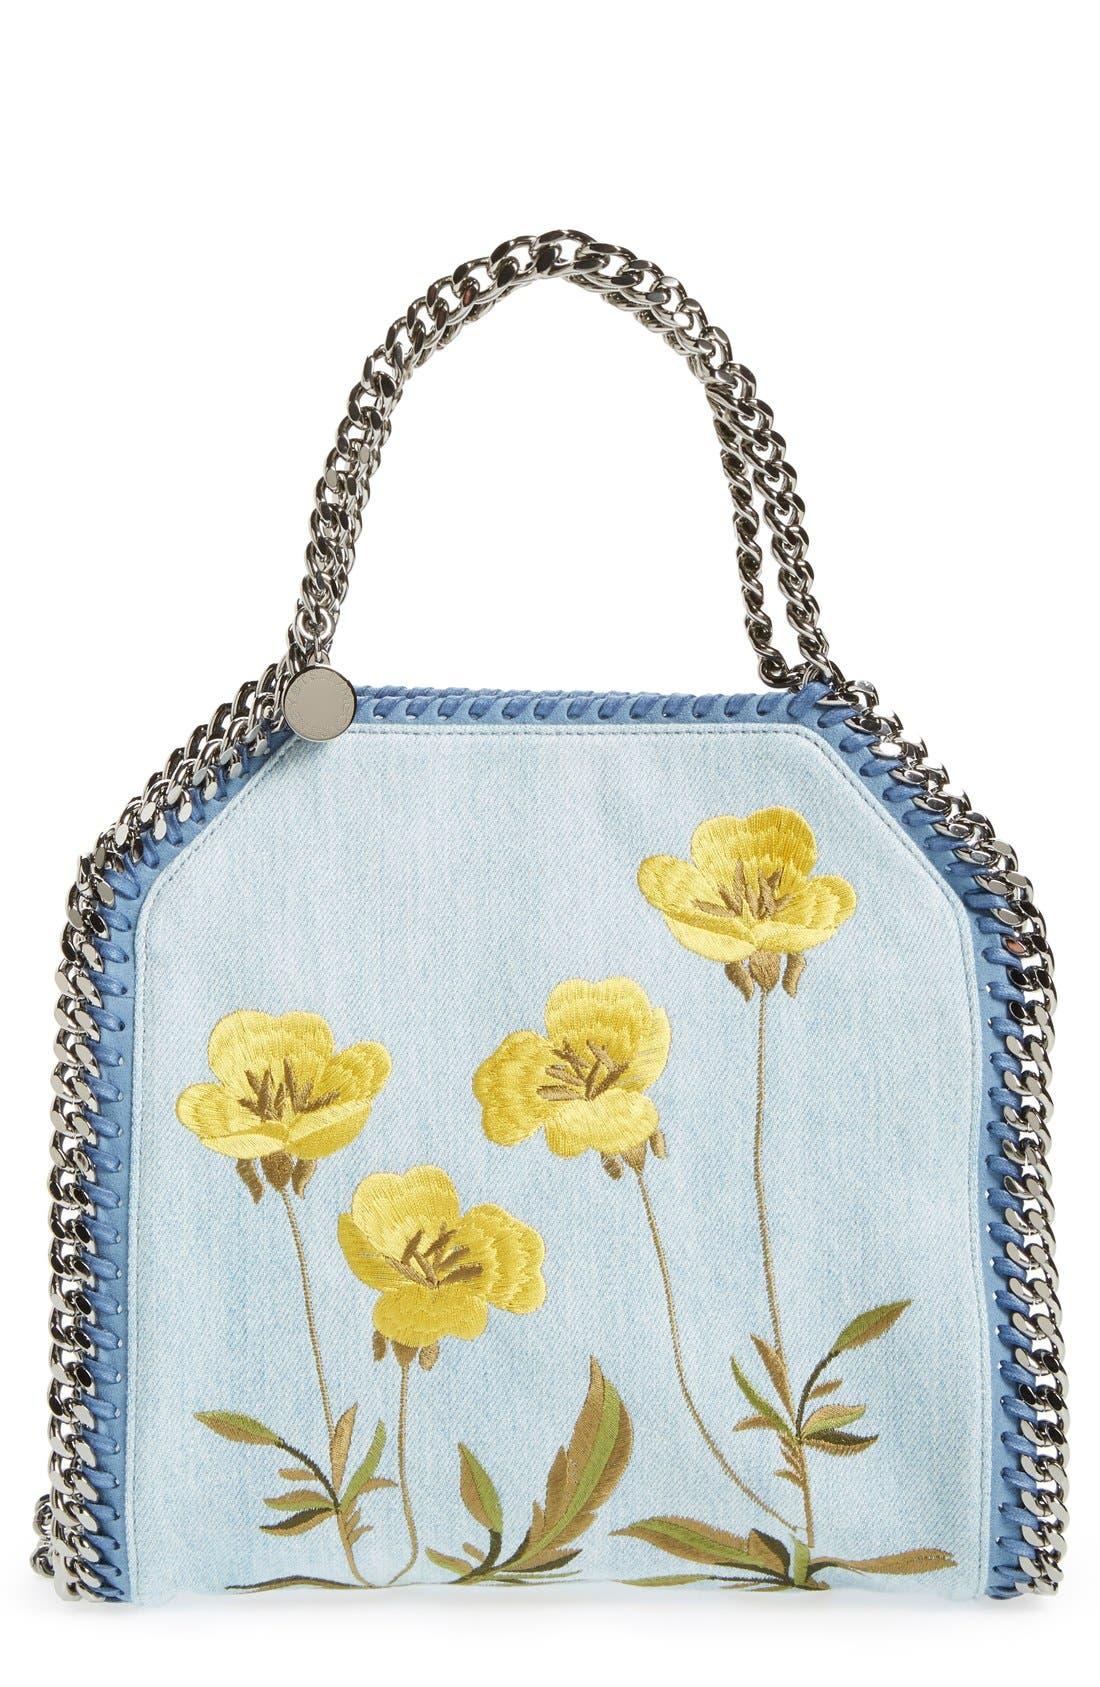 Alternate Image 1 Selected - Stella McCartney 'Mini Falabella - Poppy' Embroidered Denim Tote